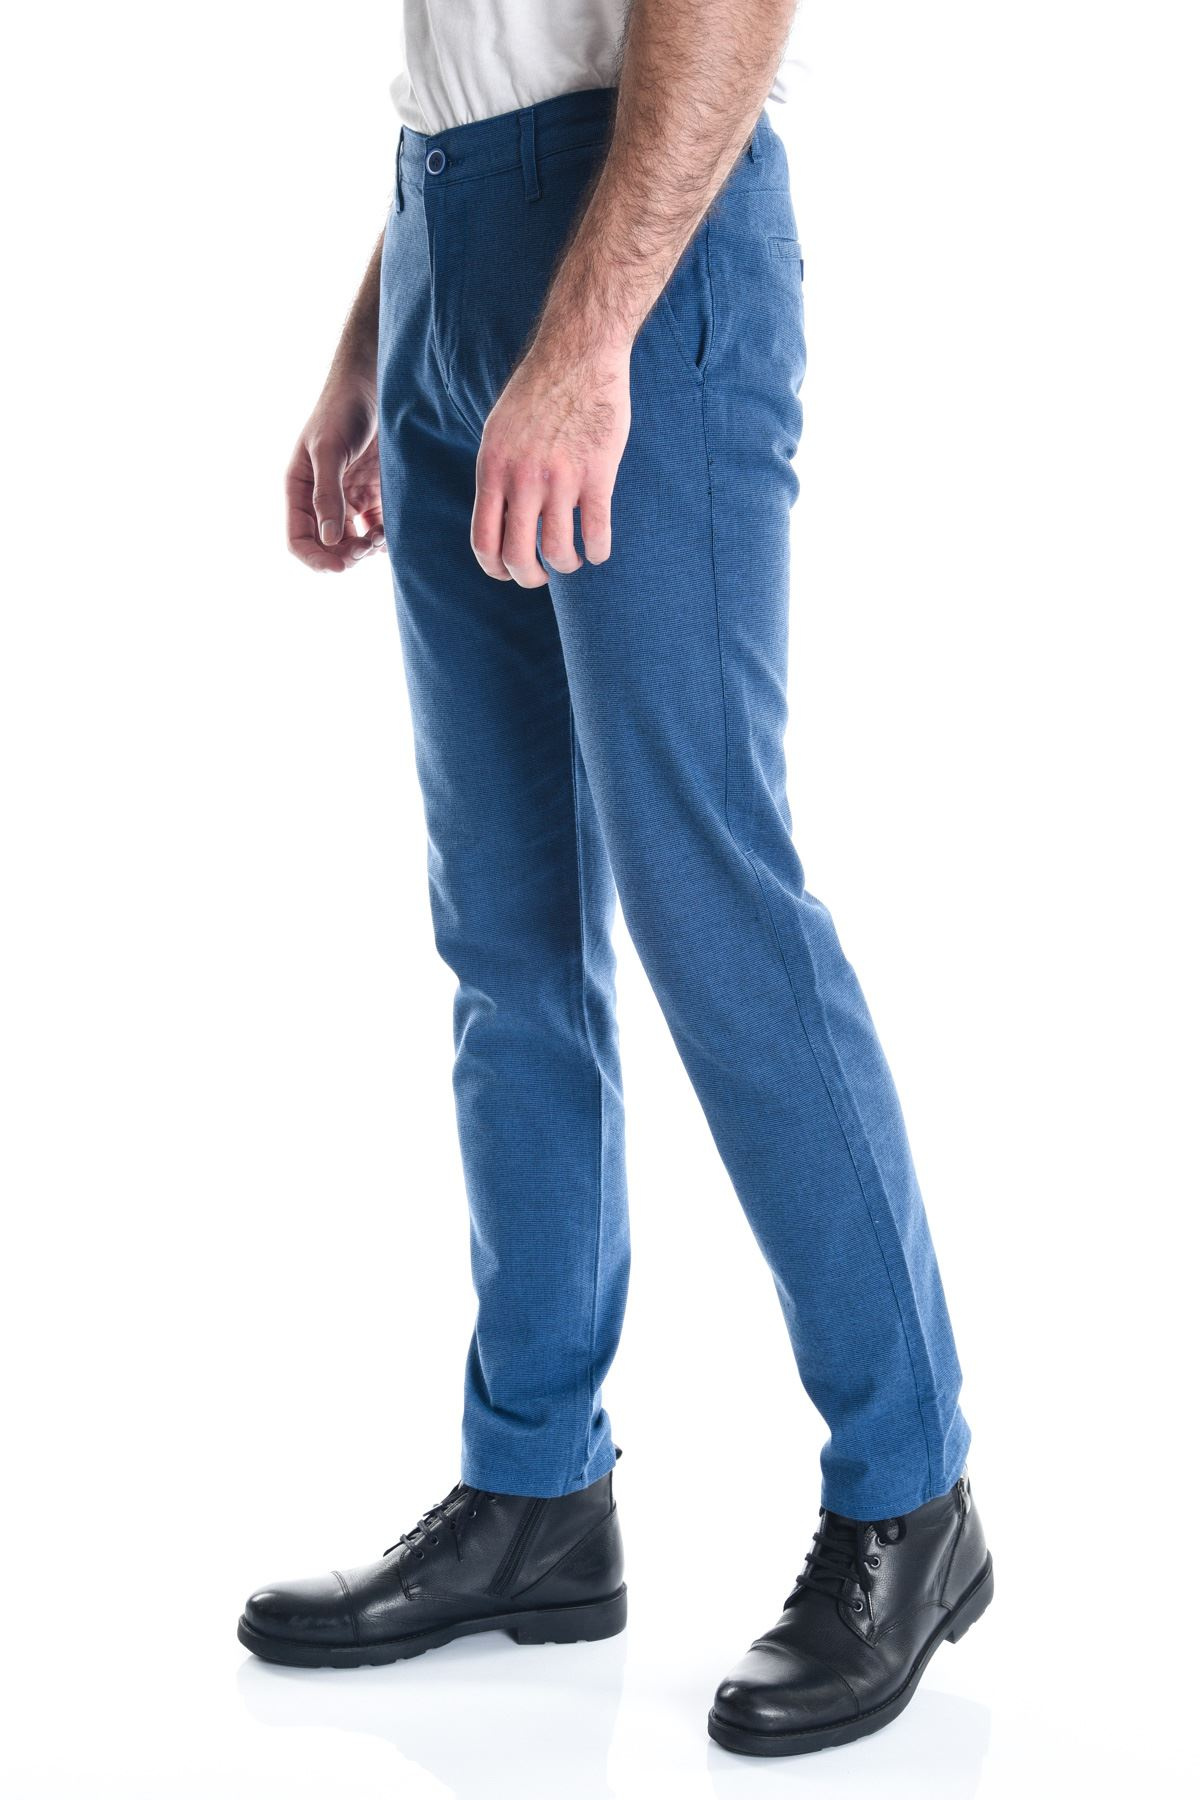 Açık Lacivert Slimfit Armürlü Erkek Chino Pantolon